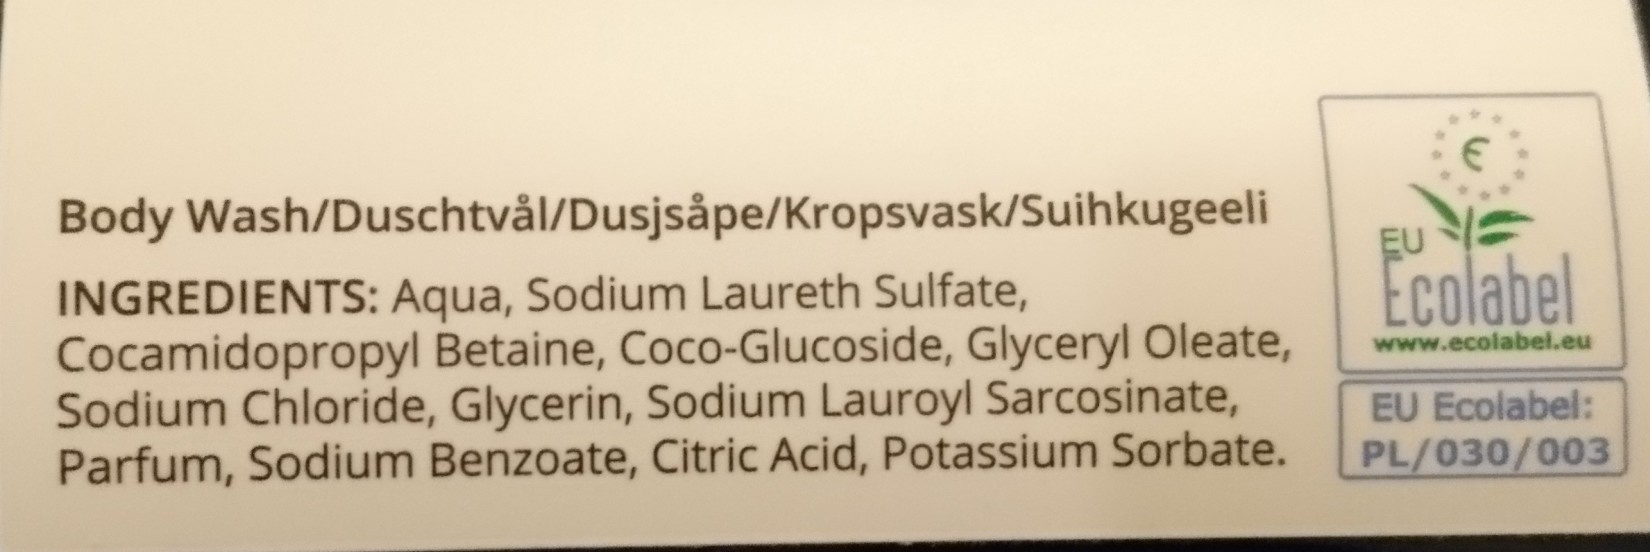 Coconut Milk Body Wash - Ingredients